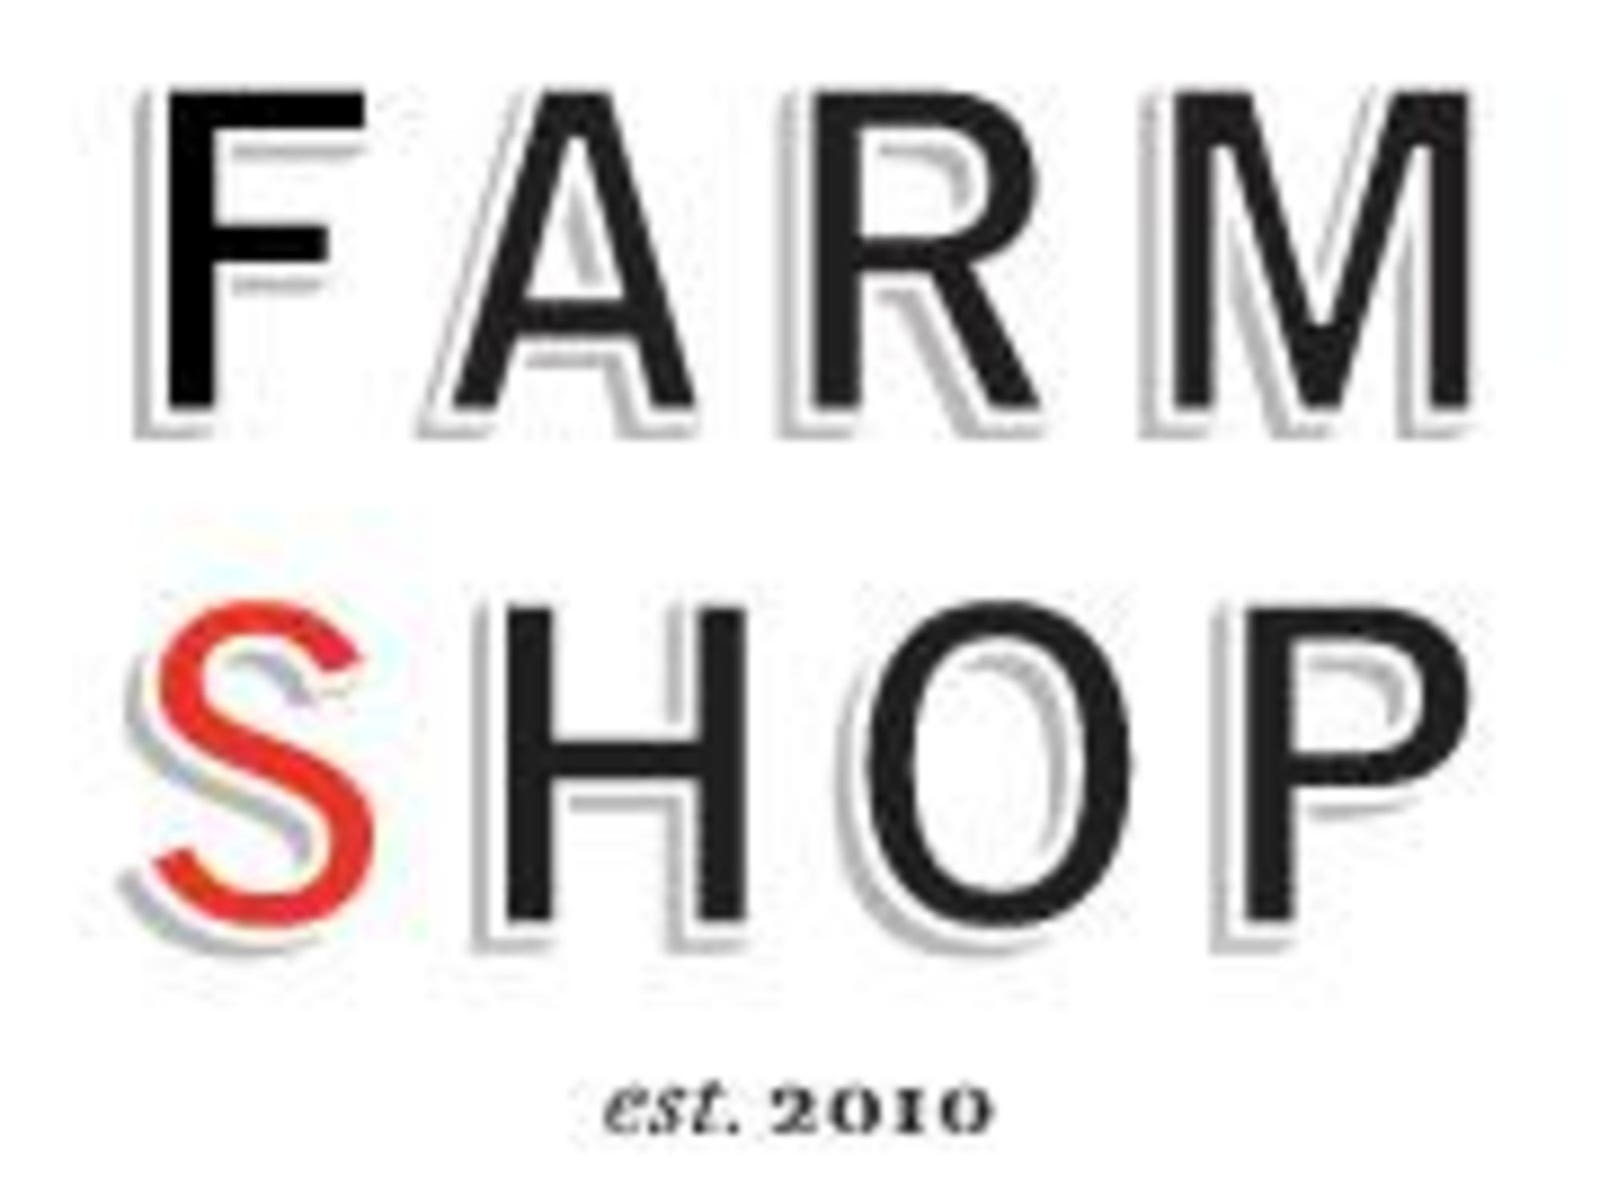 Farmshop